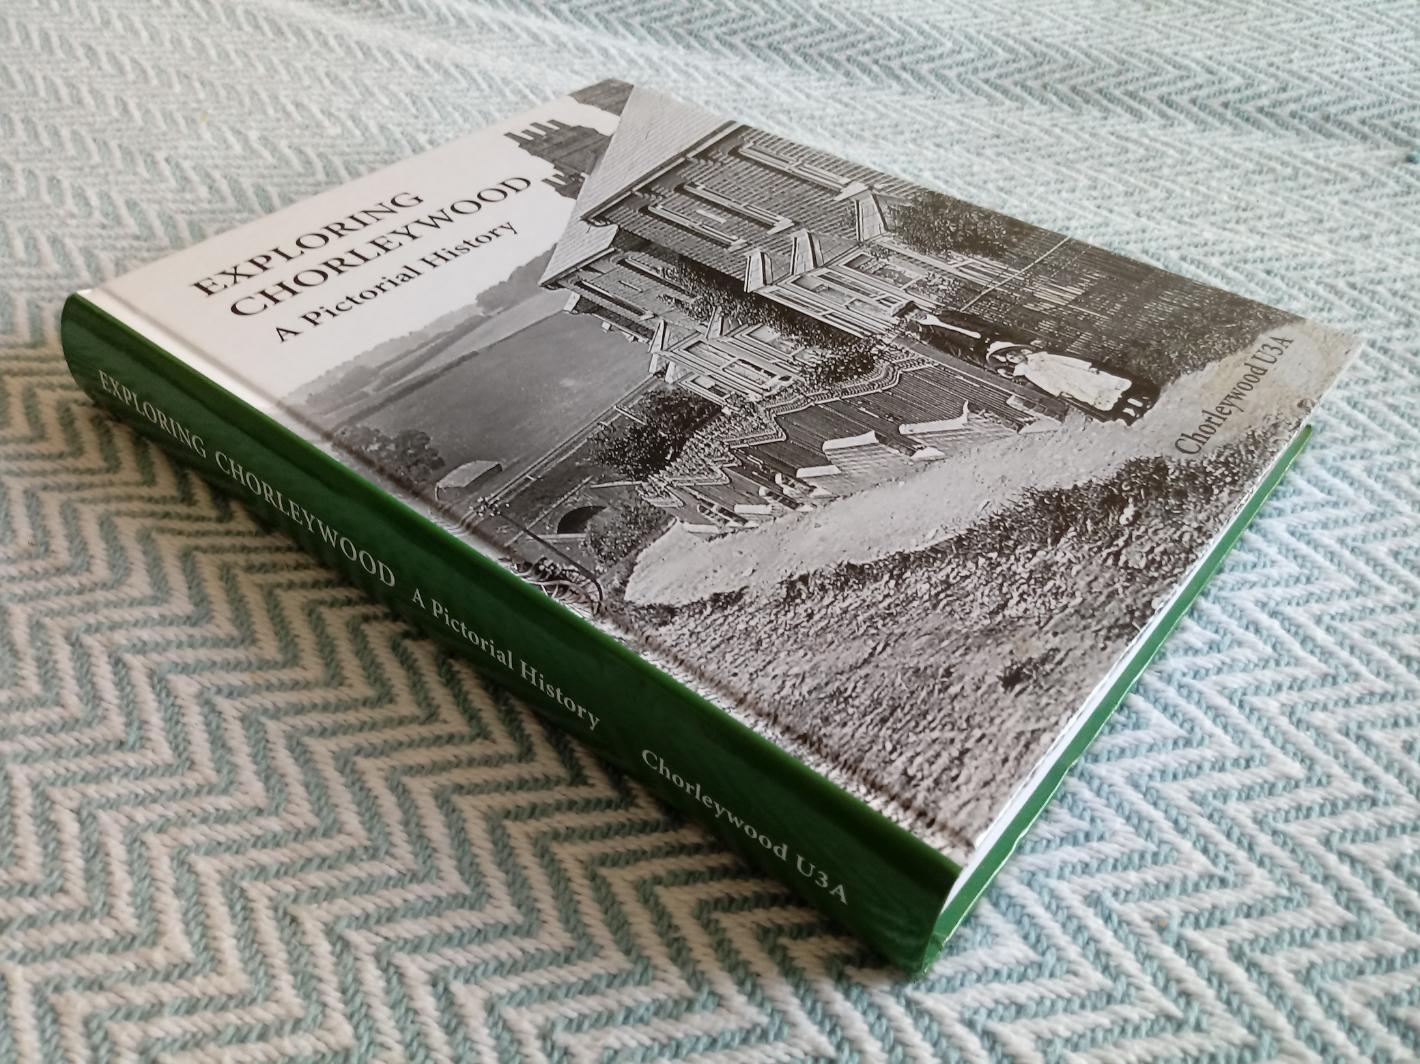 Exploring Chorleywood A Pictorial History by Members of Chorleywood U3A Sue Clark, David